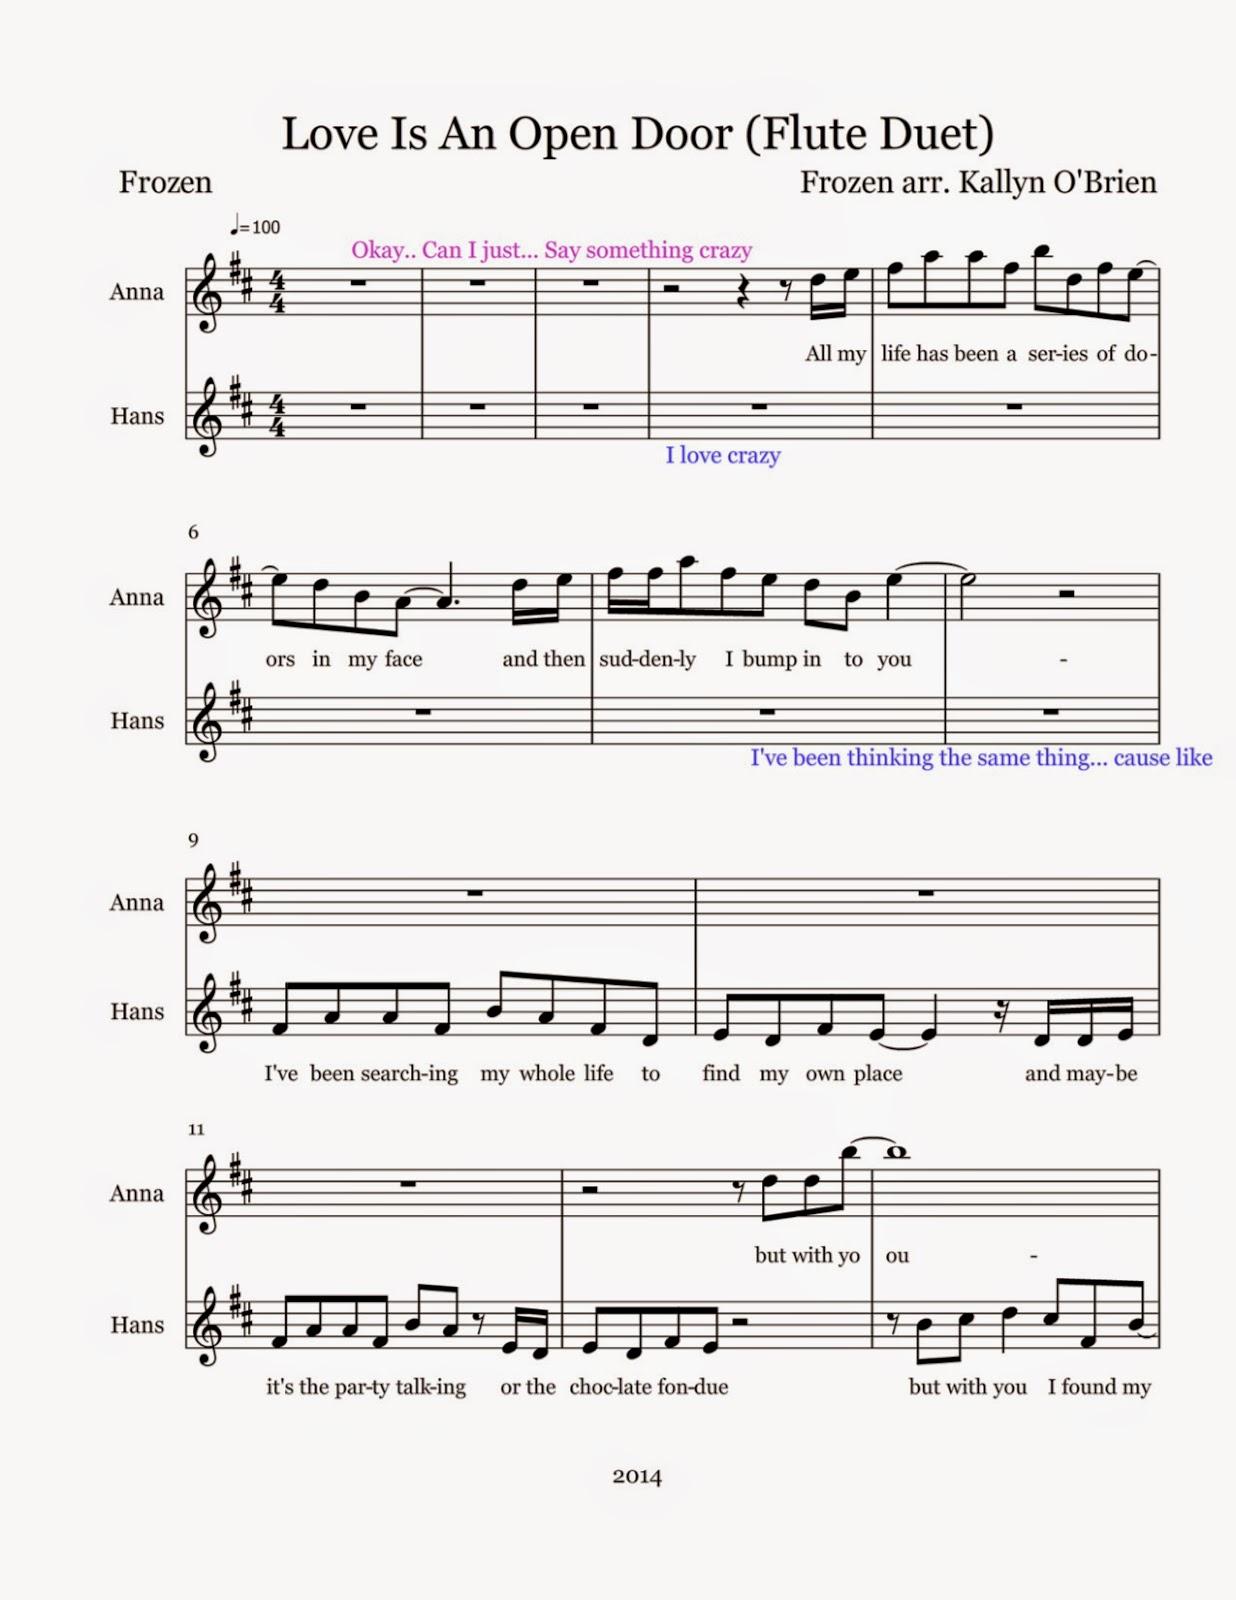 Love Is Blue Sheet Music Richard Clayderman PDF Free Download